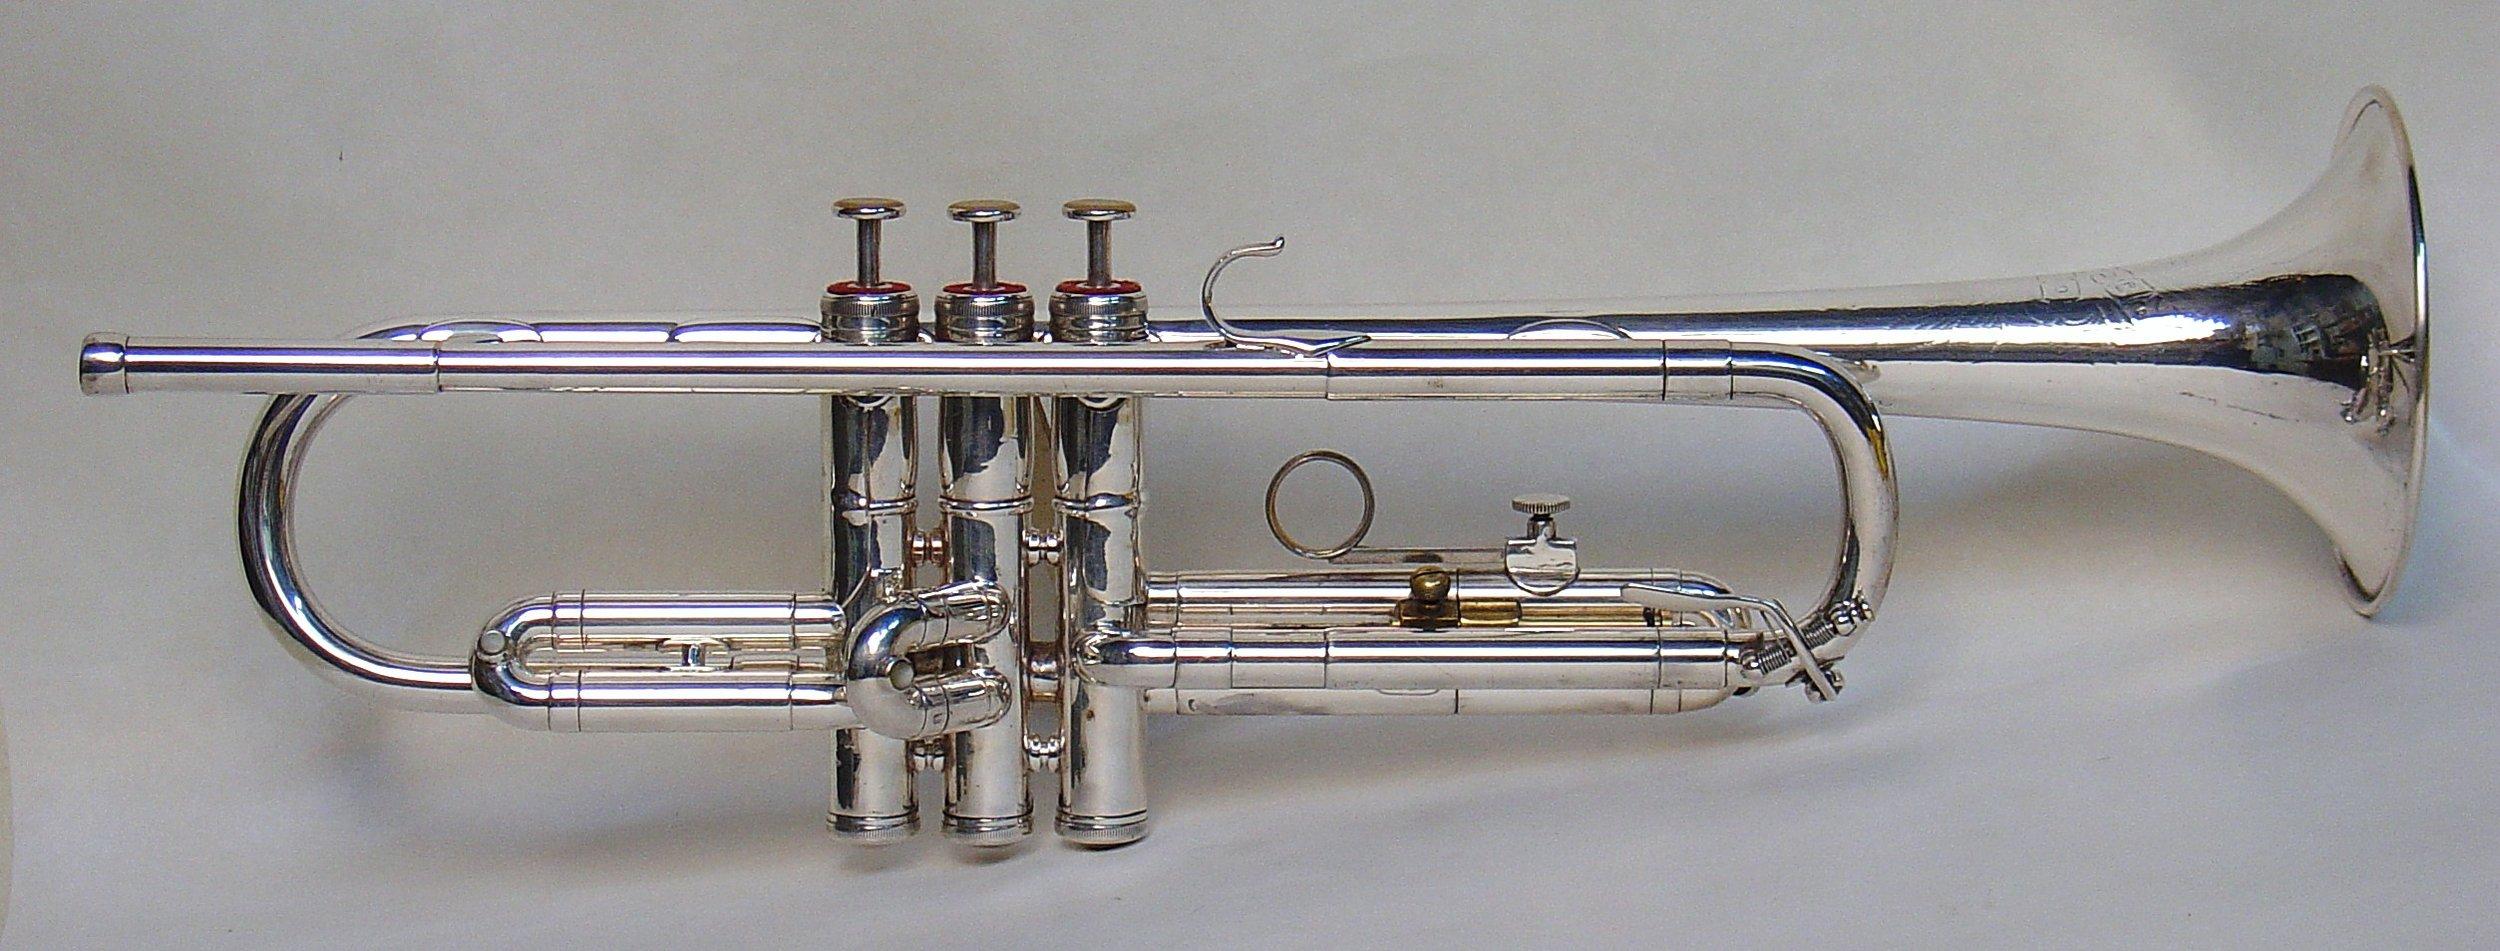 Uan Rasey's Recording Model Trumpet